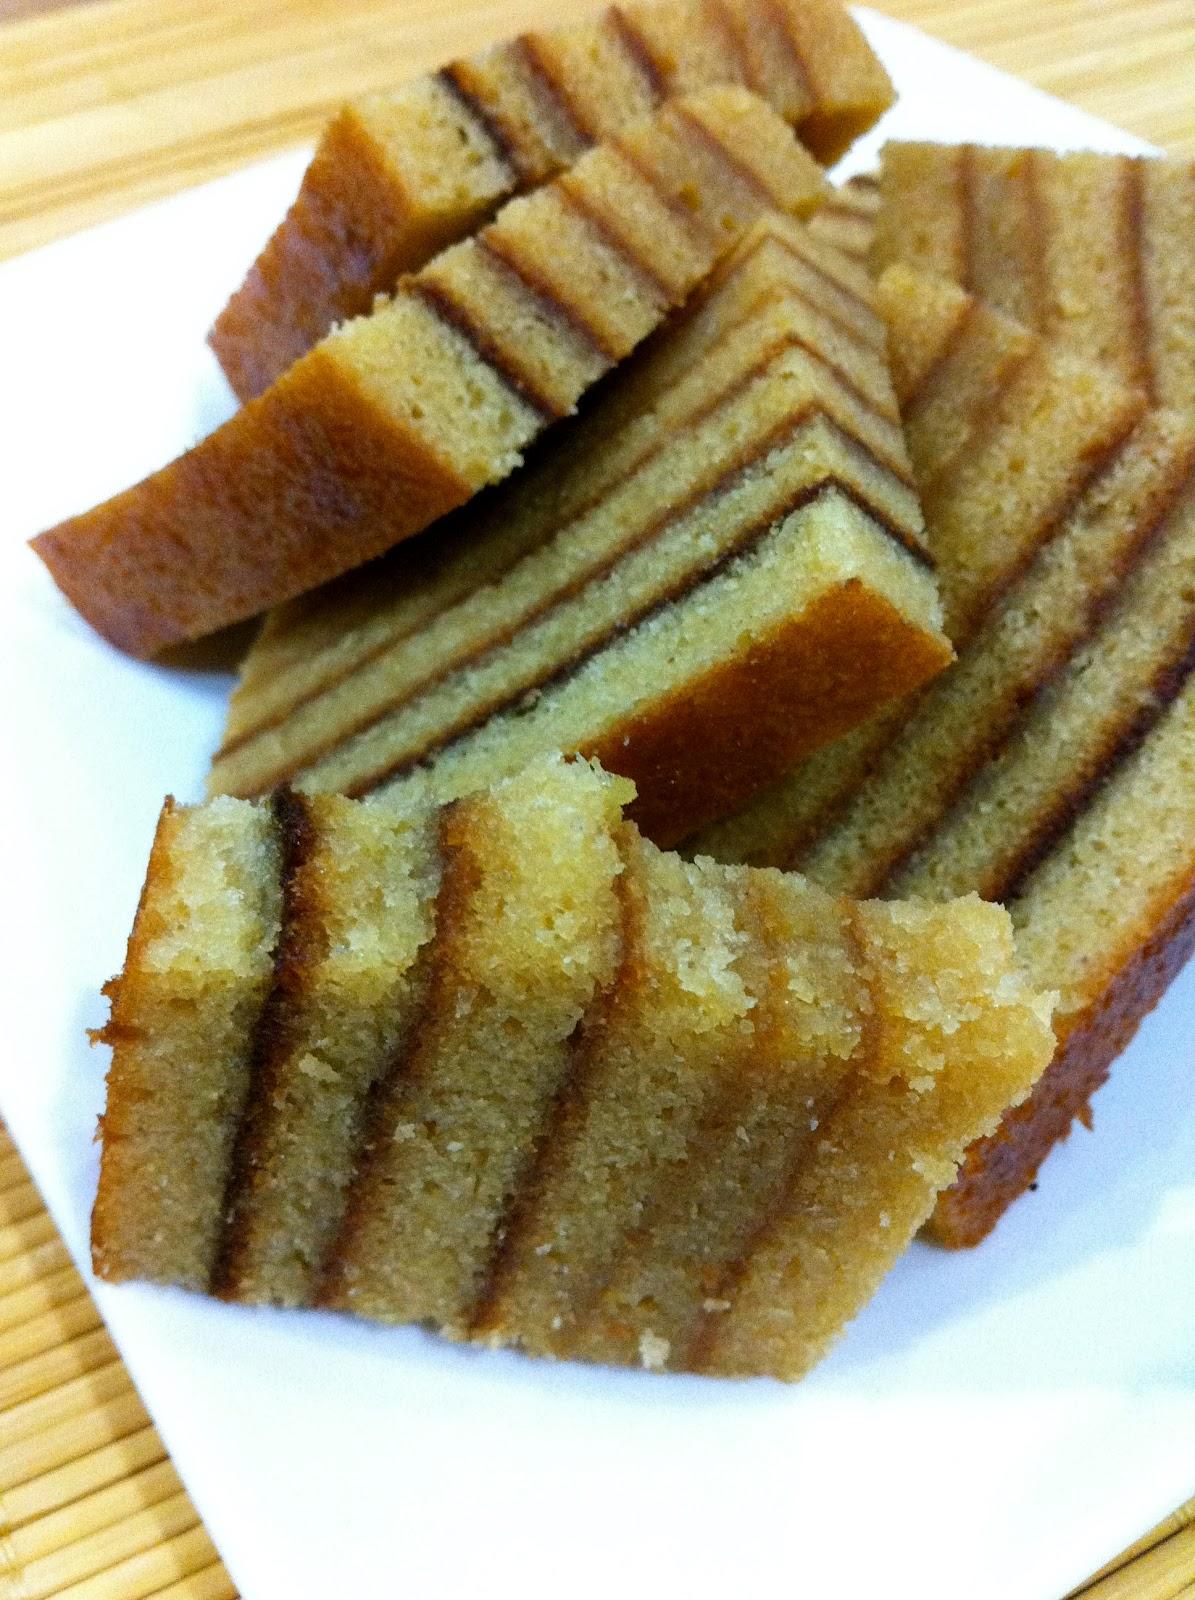 sarawak cake - photo #13